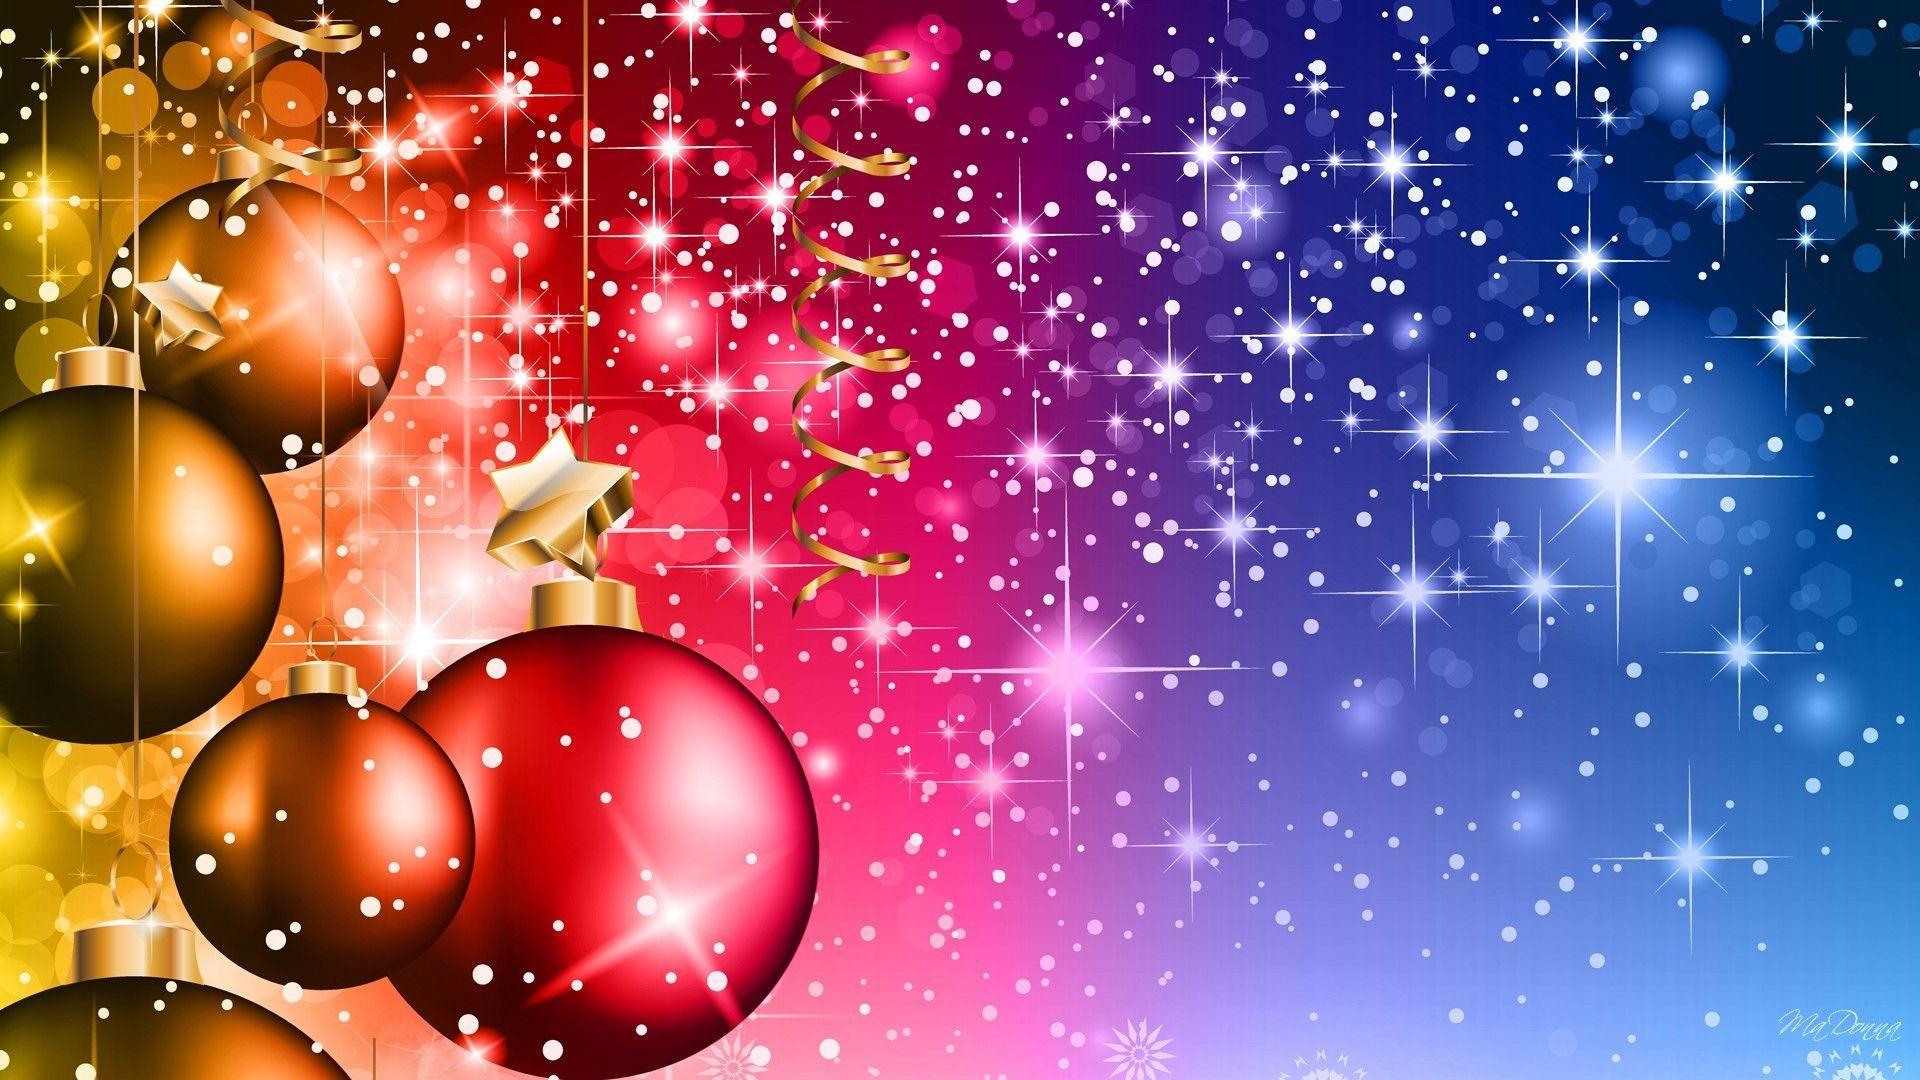 Hd Christmas Wallpapers Top Free Hd Christmas Backgrounds